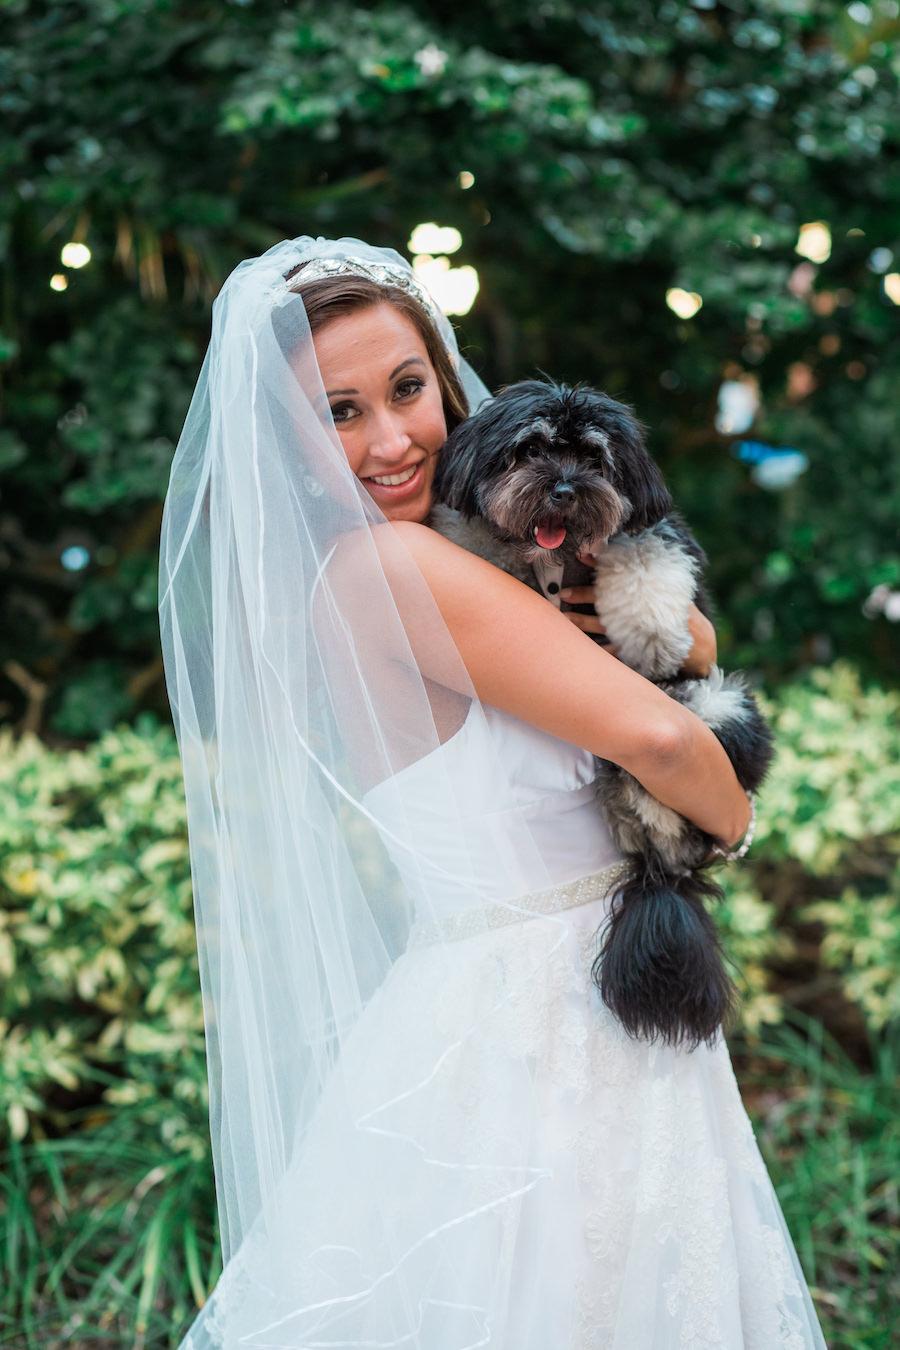 Bride Wedding Portrait with Dog | St. Petersburg Pet Wedding Planner Fairytail Petcare